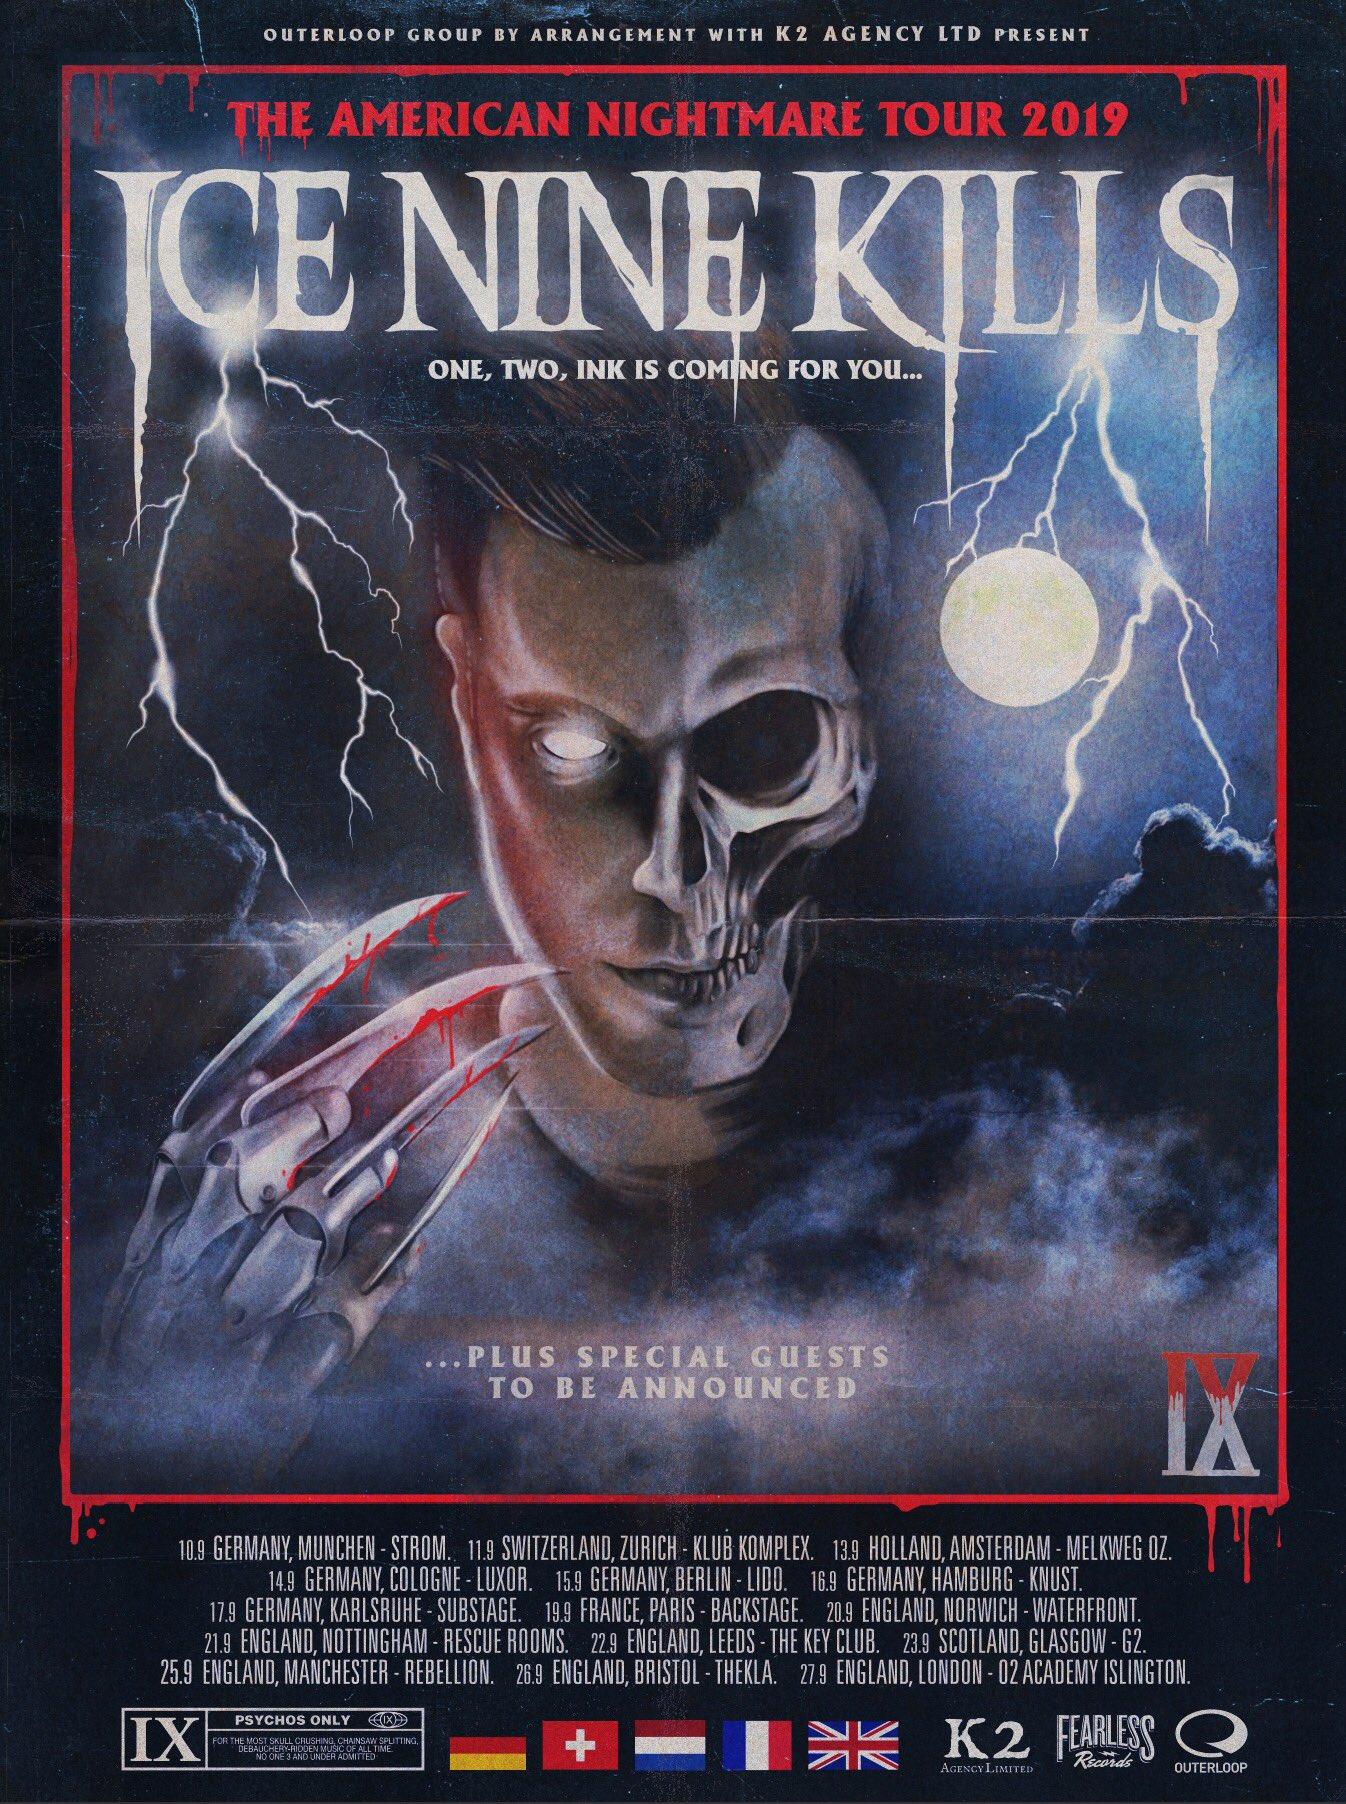 ice Nine Kills 2019 UK Tour Dates